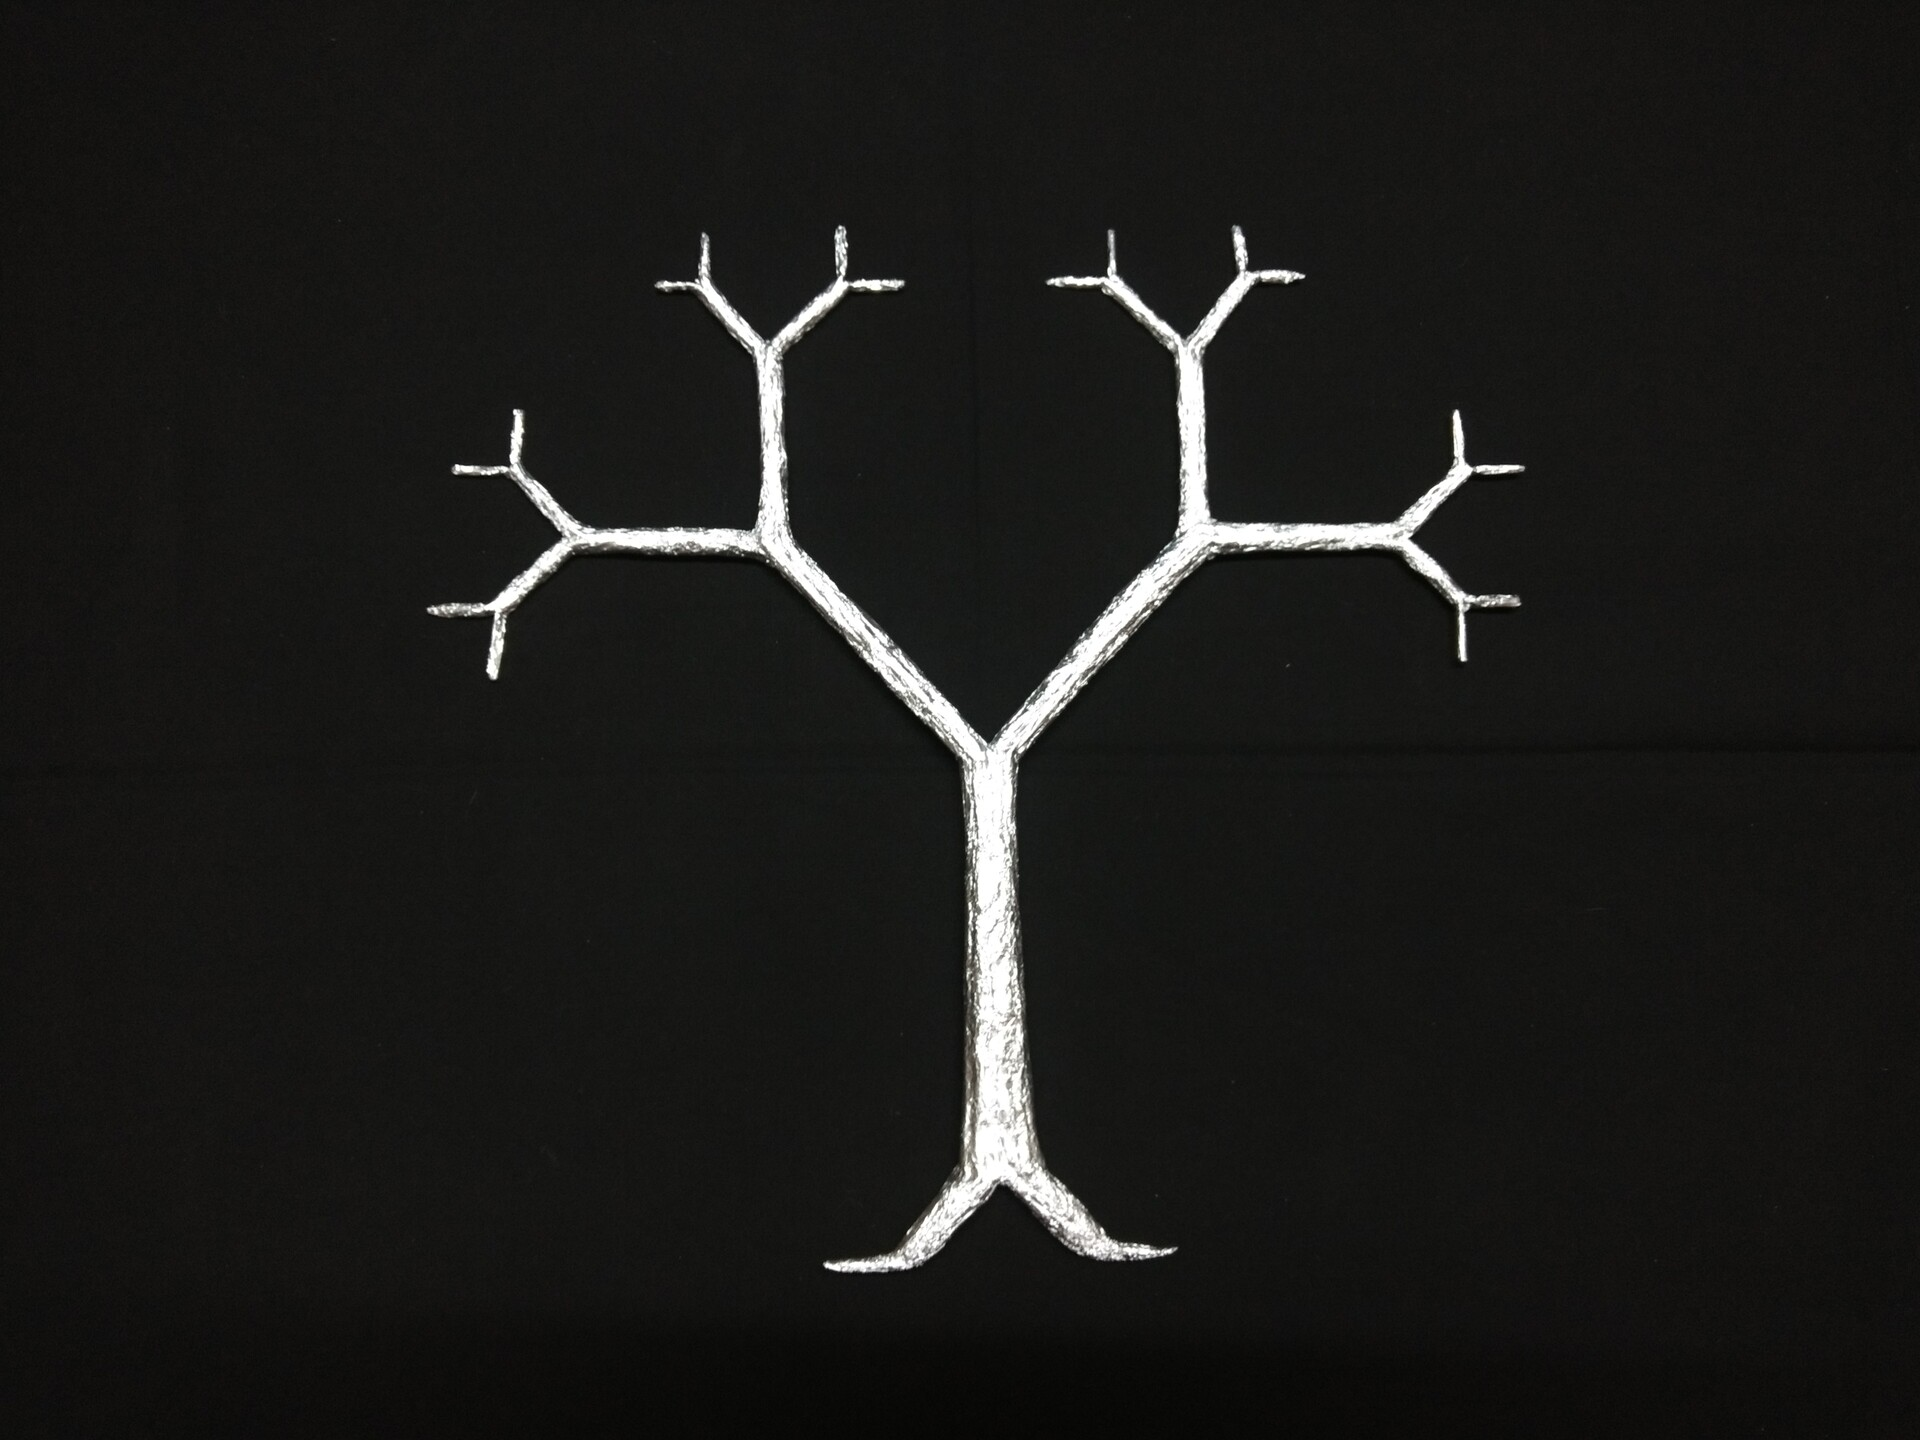 Yashvir Singh Dalal Silver Tree